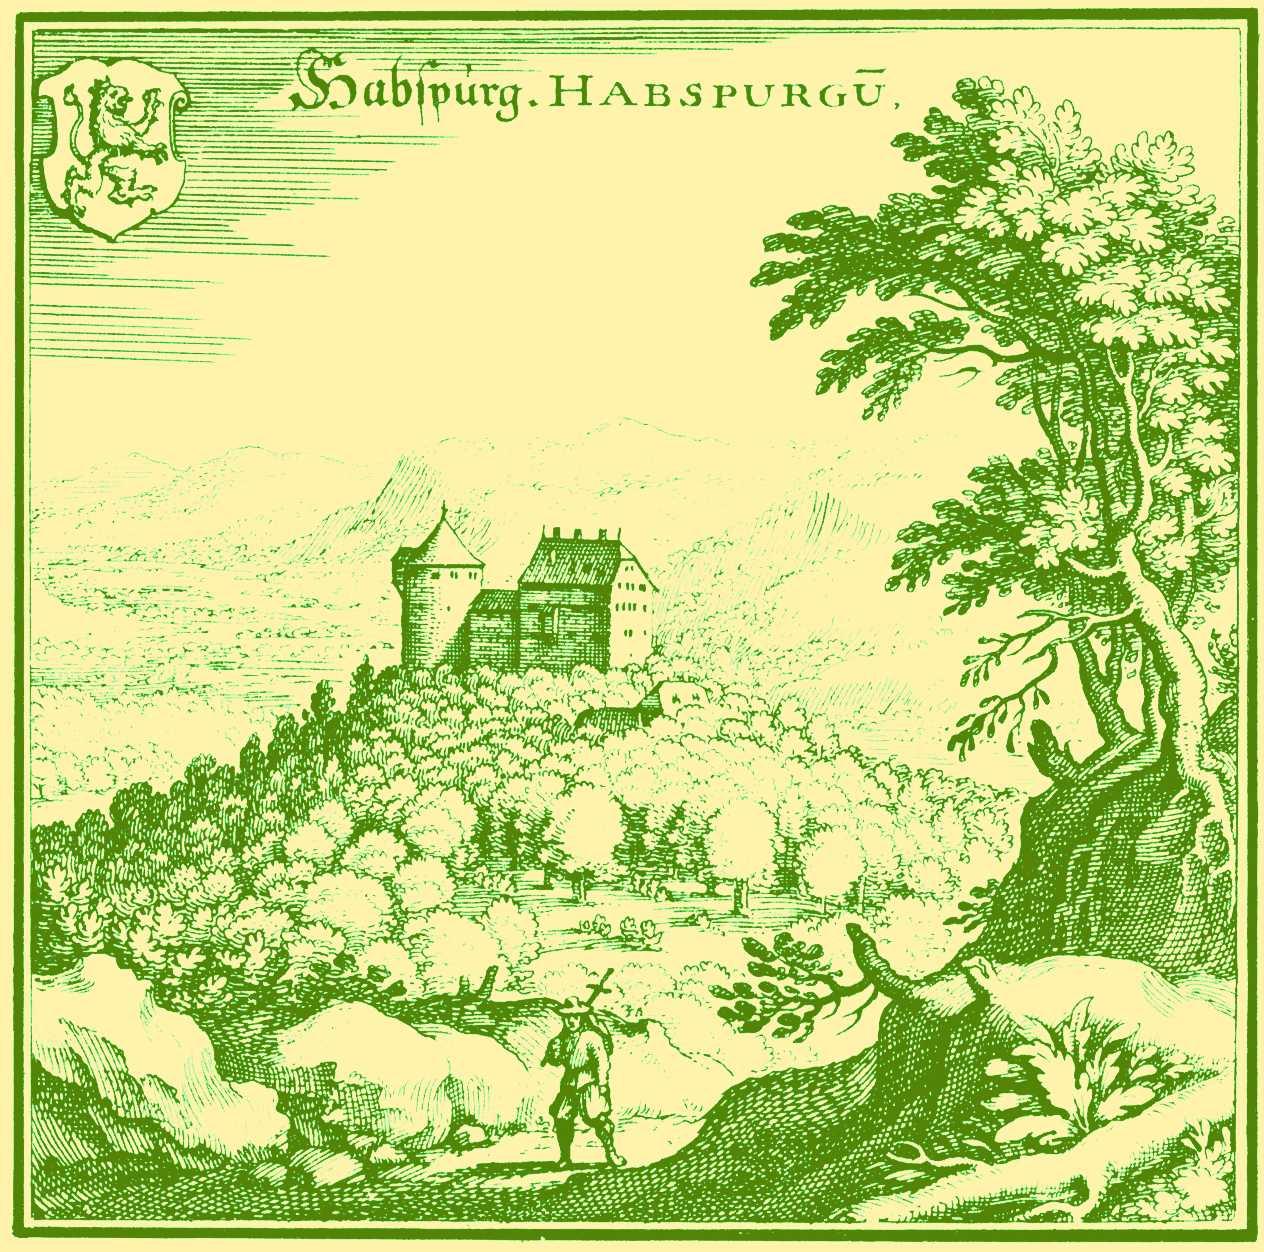 Habsburg-merian-1642-1-c1